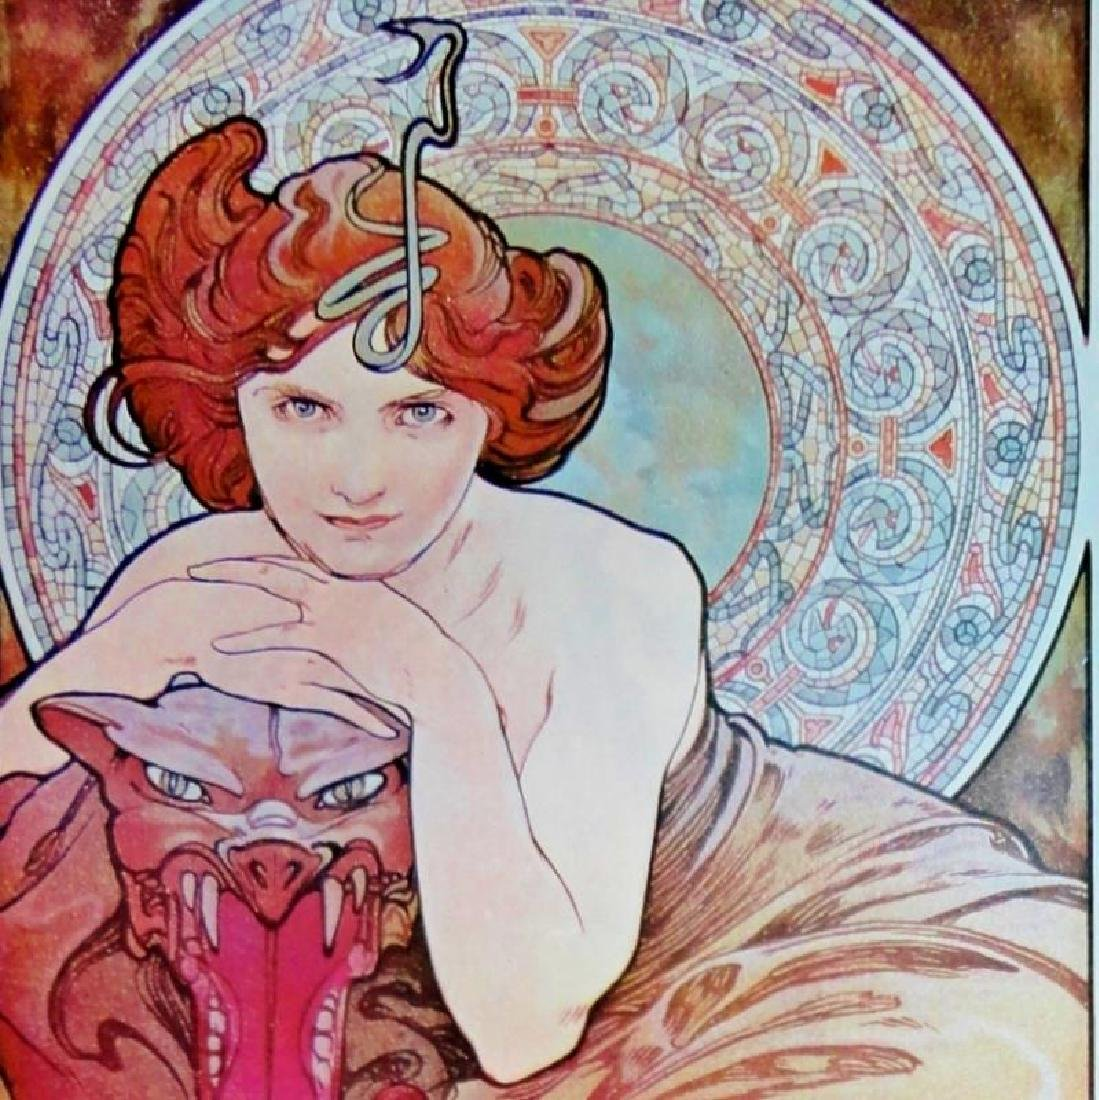 3 Large Mucha Repro Antique Poster Art Prints 48X18 - 6